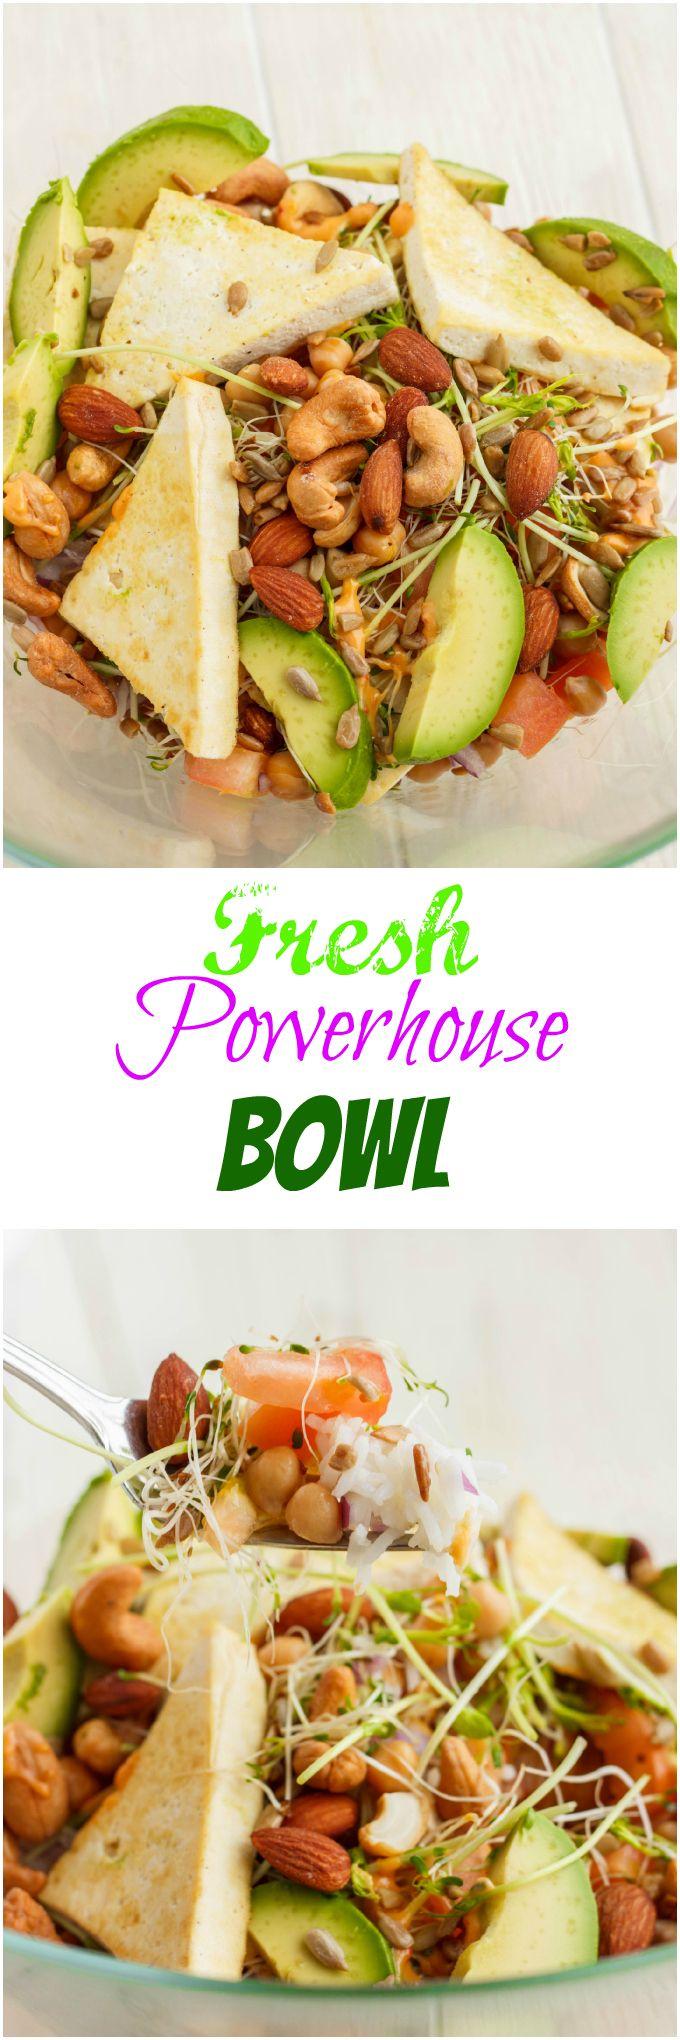 Fresh Powerhouse Bowl: Recipe from the popular Toronto Restaurant! #vegan and #glutenfree